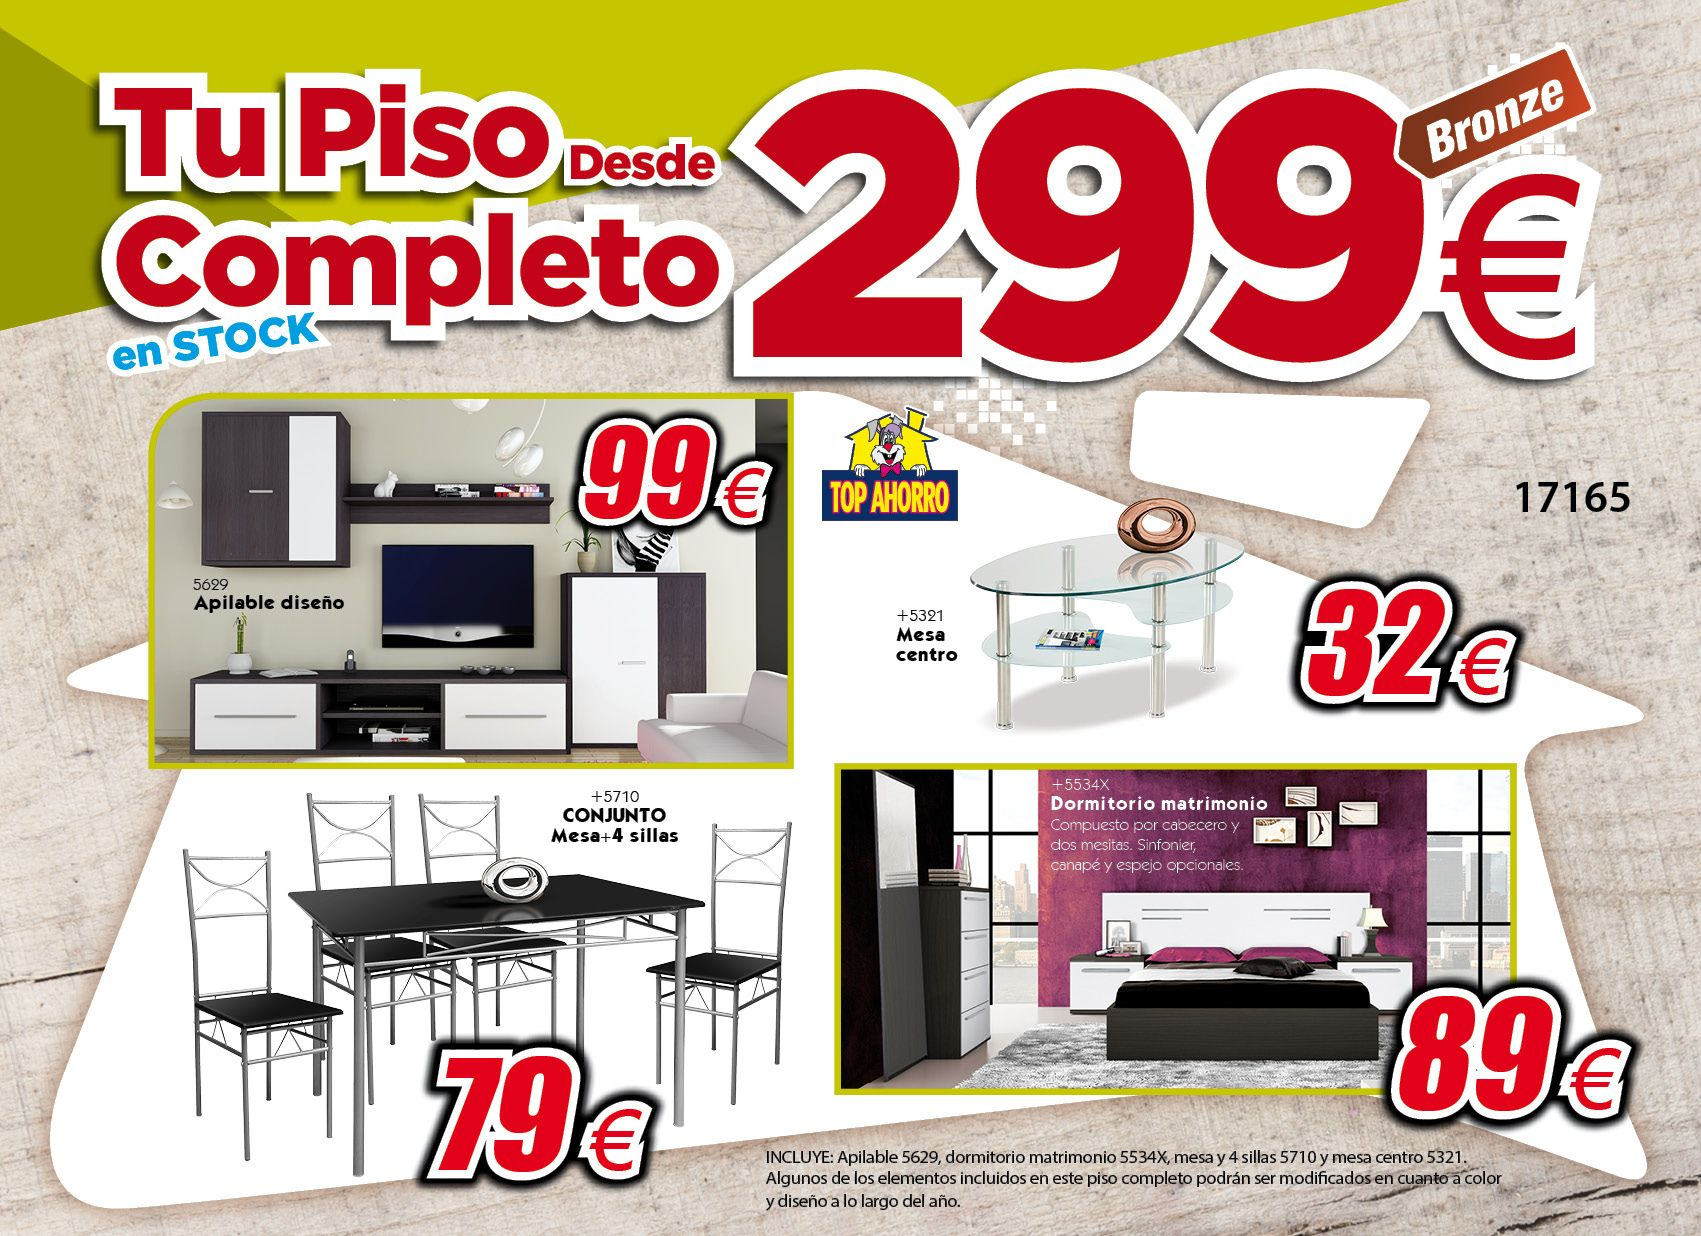 Muebles Piso Completo Barato - Pisos Completos[mjhdah]http://www.ahorrototal.com/img/cms/Pisos%20completos/pisos%20(3).jpg